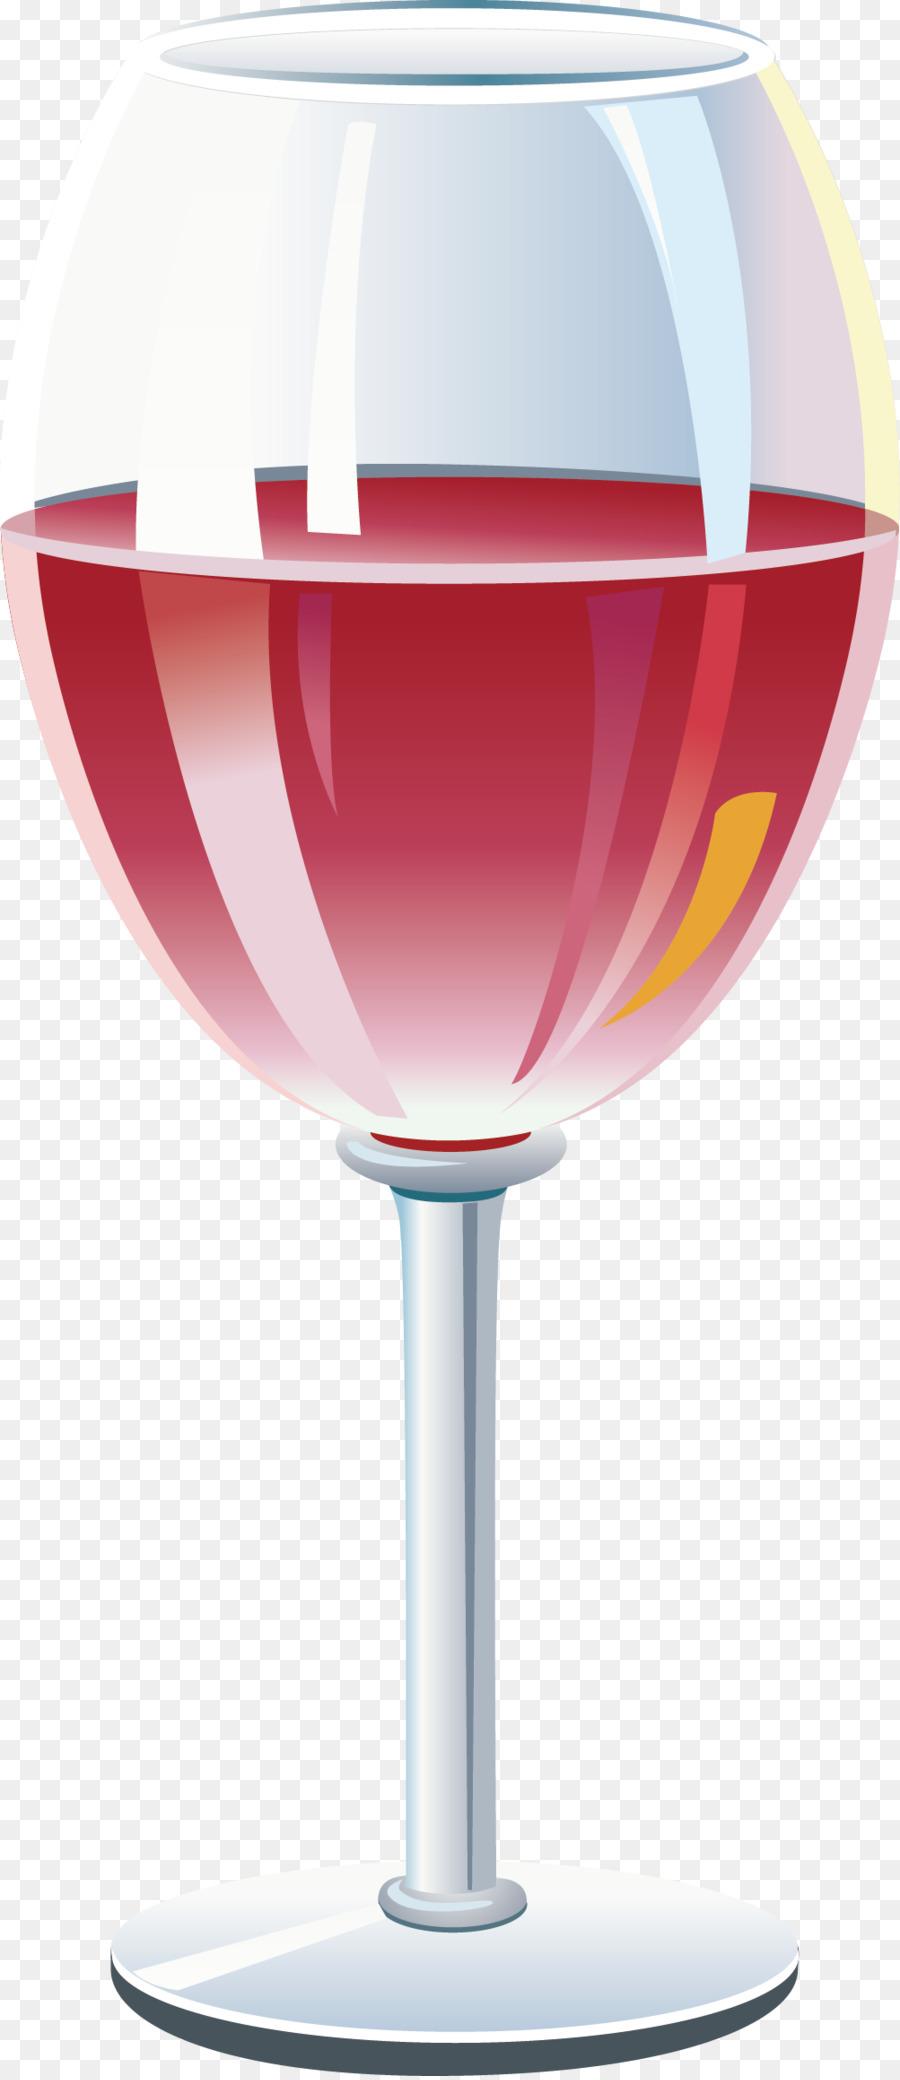 Descarga gratuita de Vino Tinto, Vino, Champagne Imágen de Png